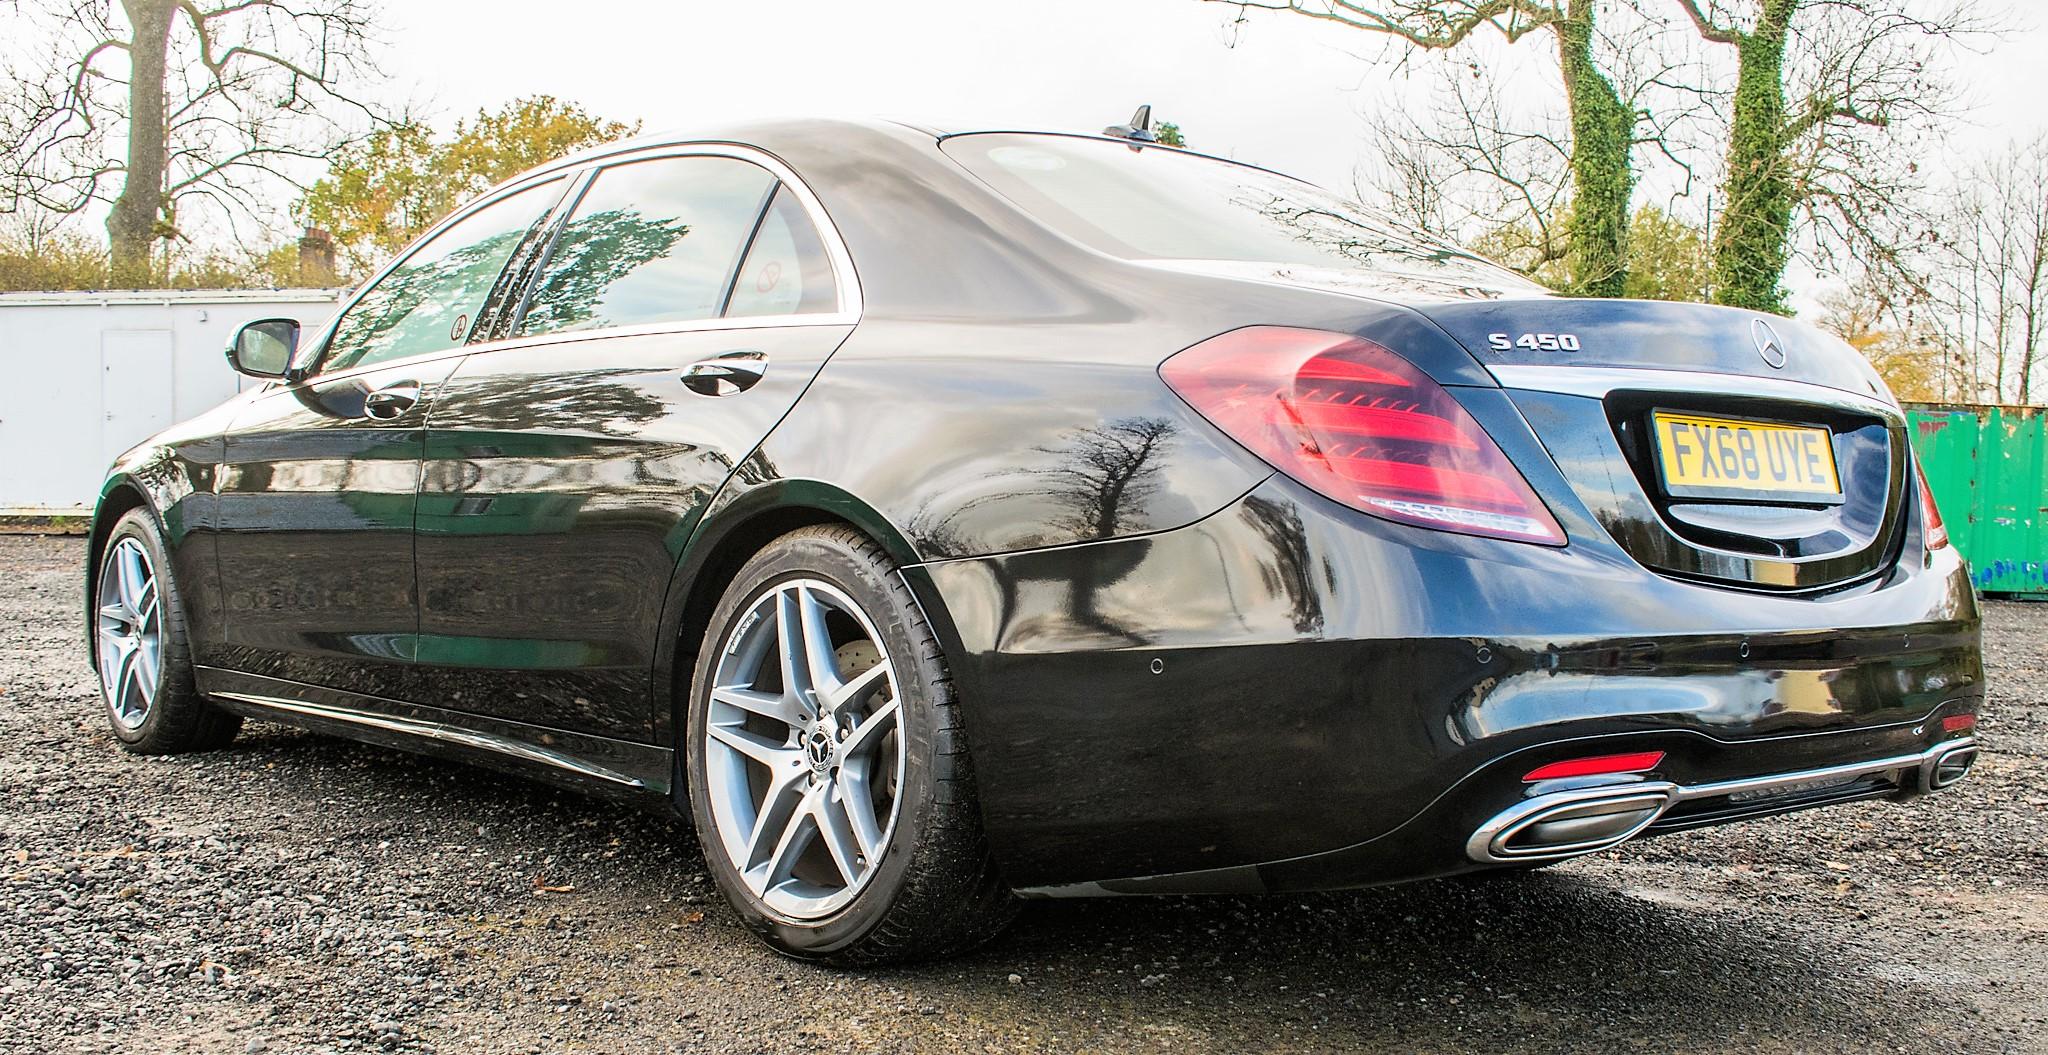 Mercedes Benz S450 L AMG Line Executive auto petrol 4 door saloon car Registration Number: FX68 - Image 4 of 33